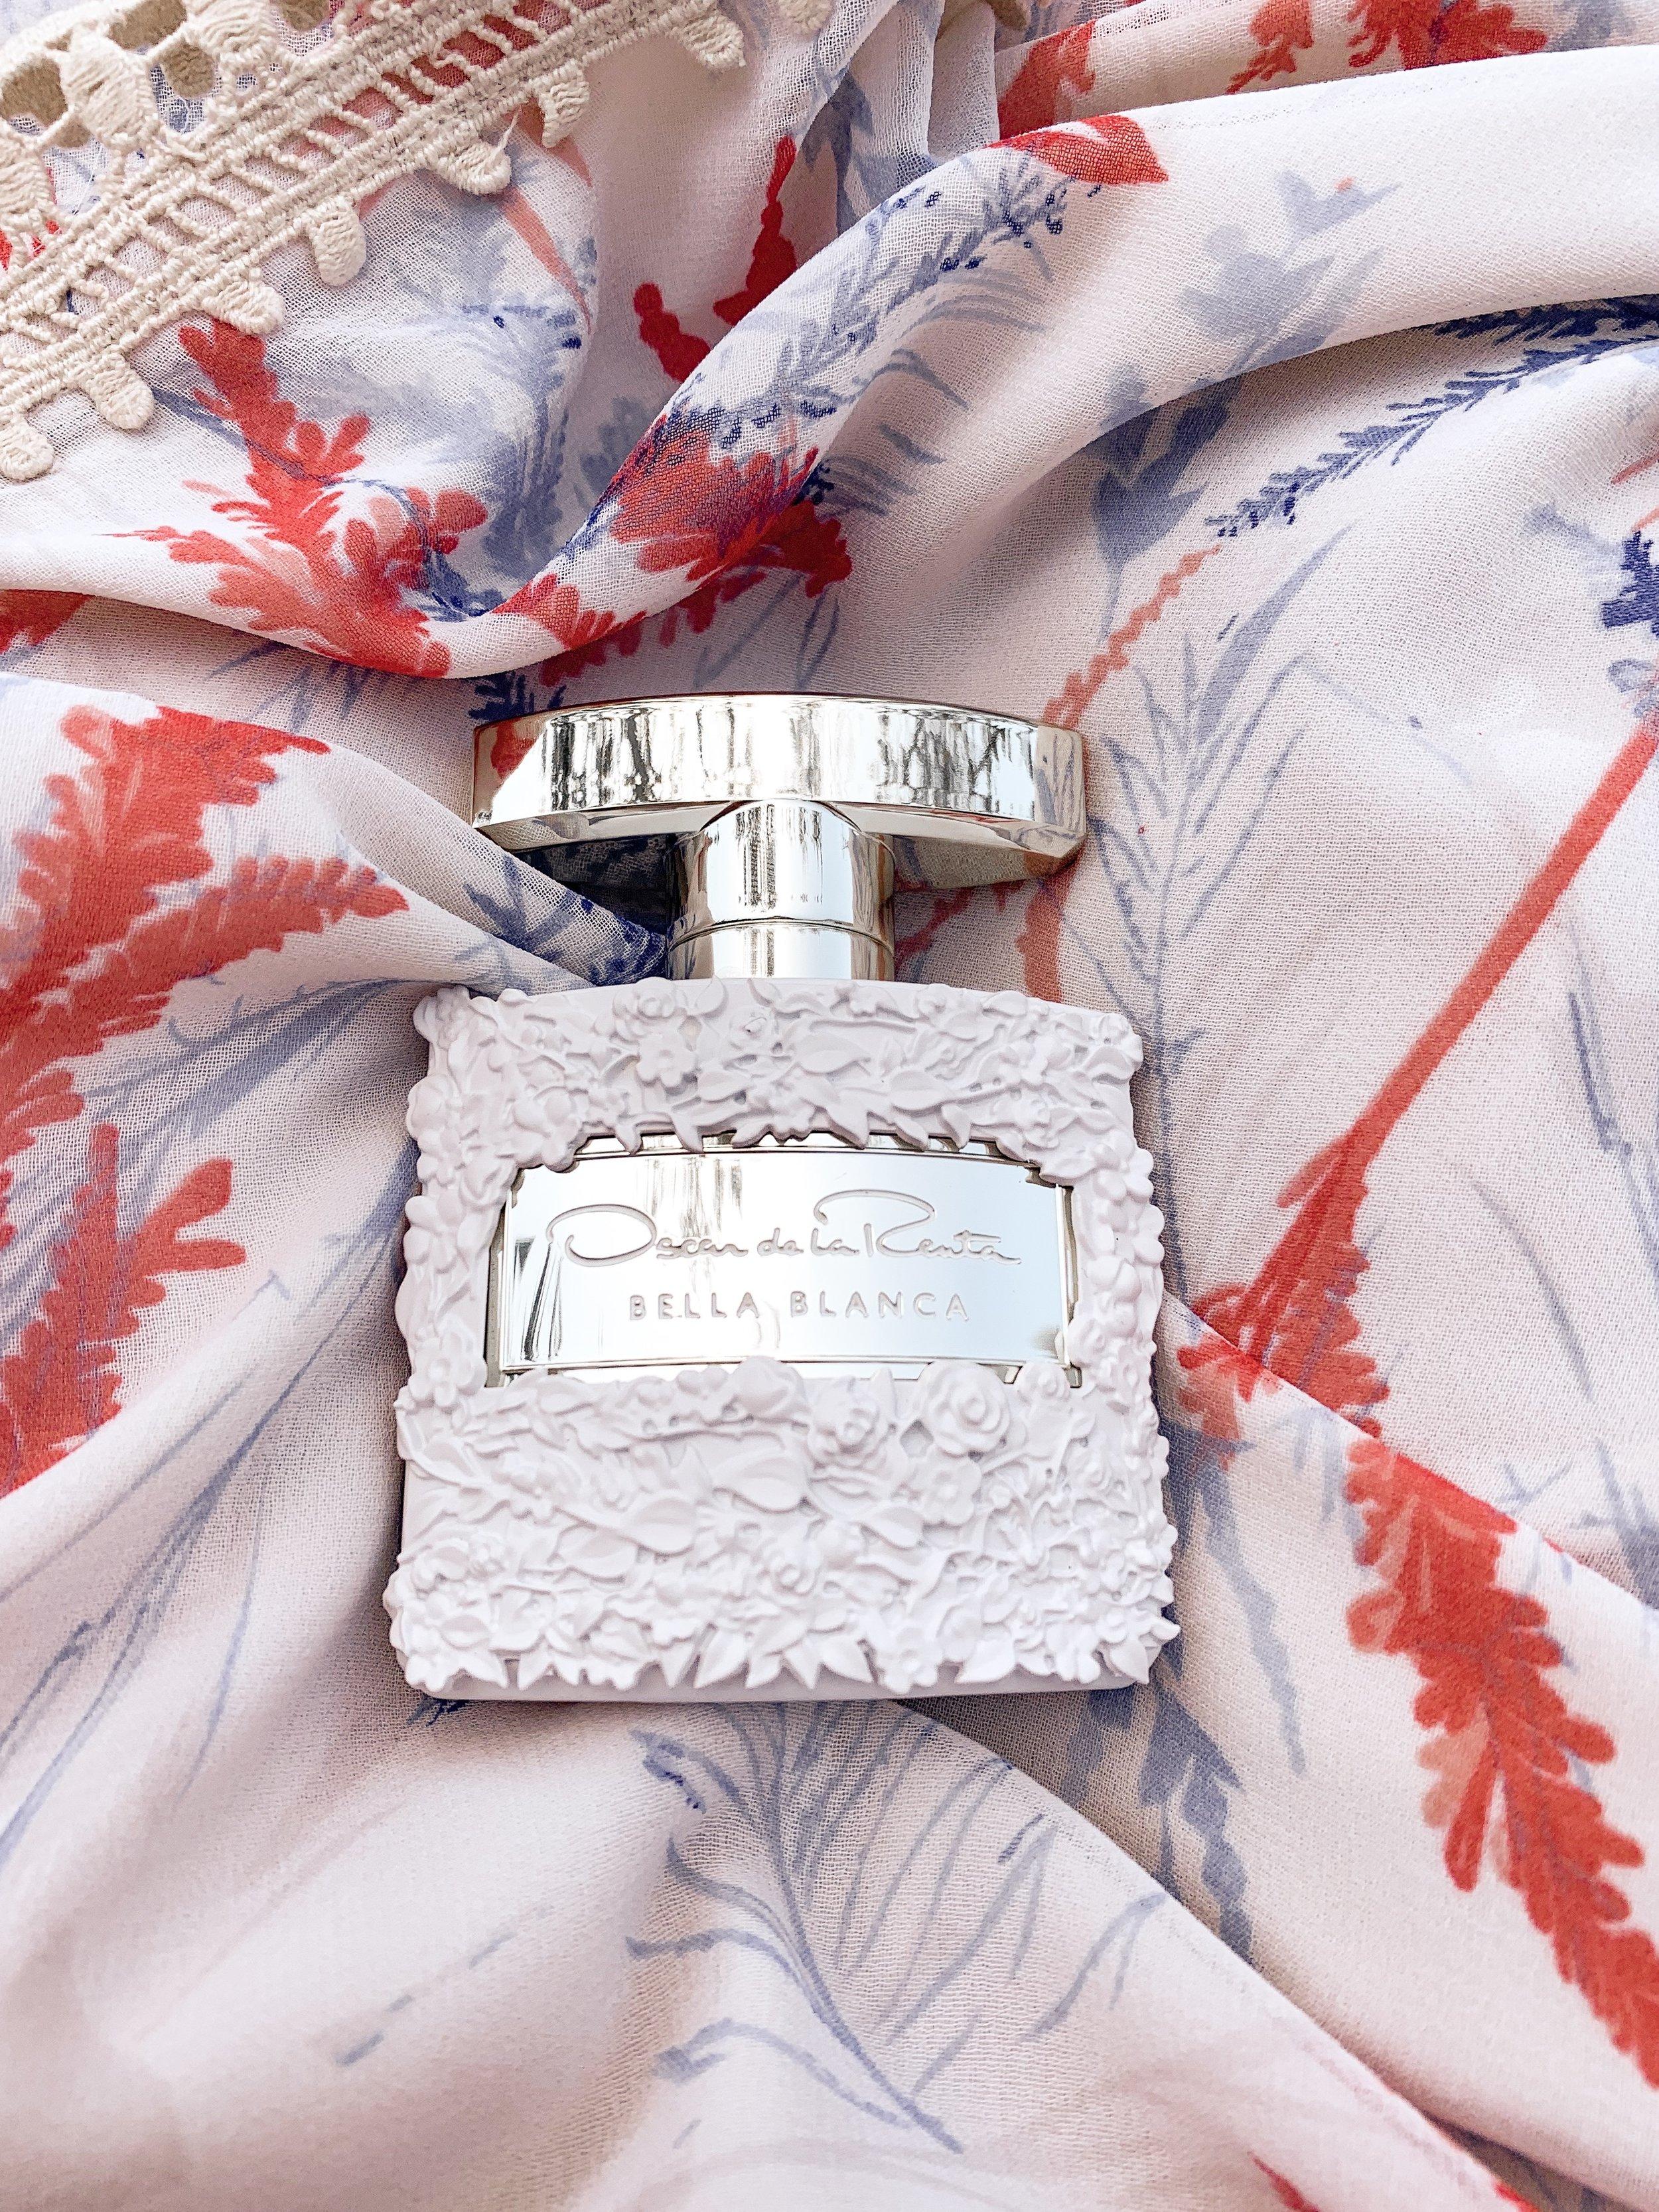 Bre Sheppard - Fresh Spring Beauty Picks Perfume.JPG